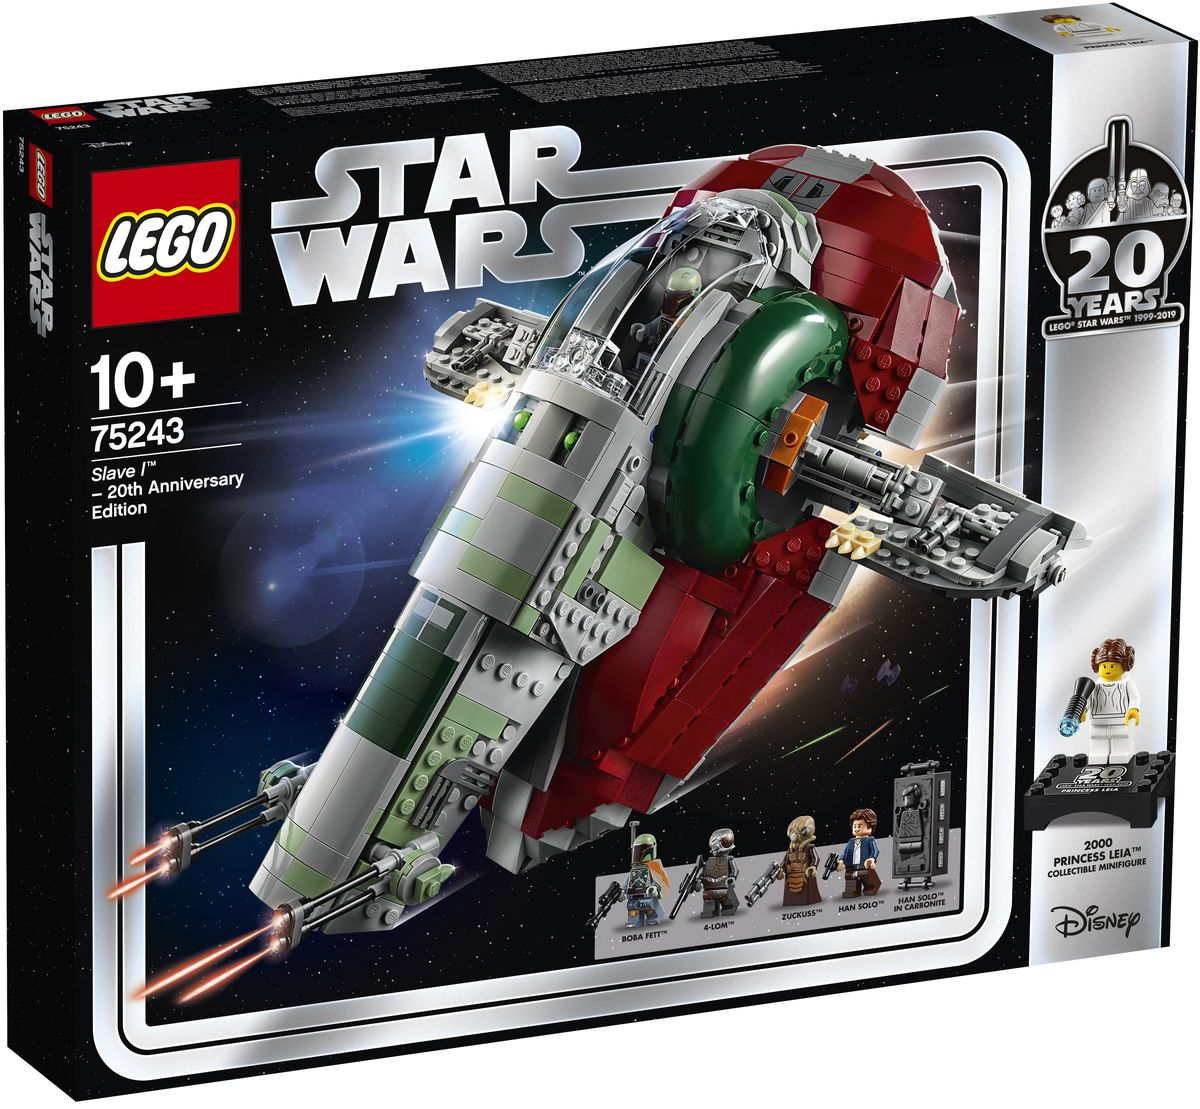 lego-slave-1-20th-anniversary-75243-box-2019 zusammengebaut.com